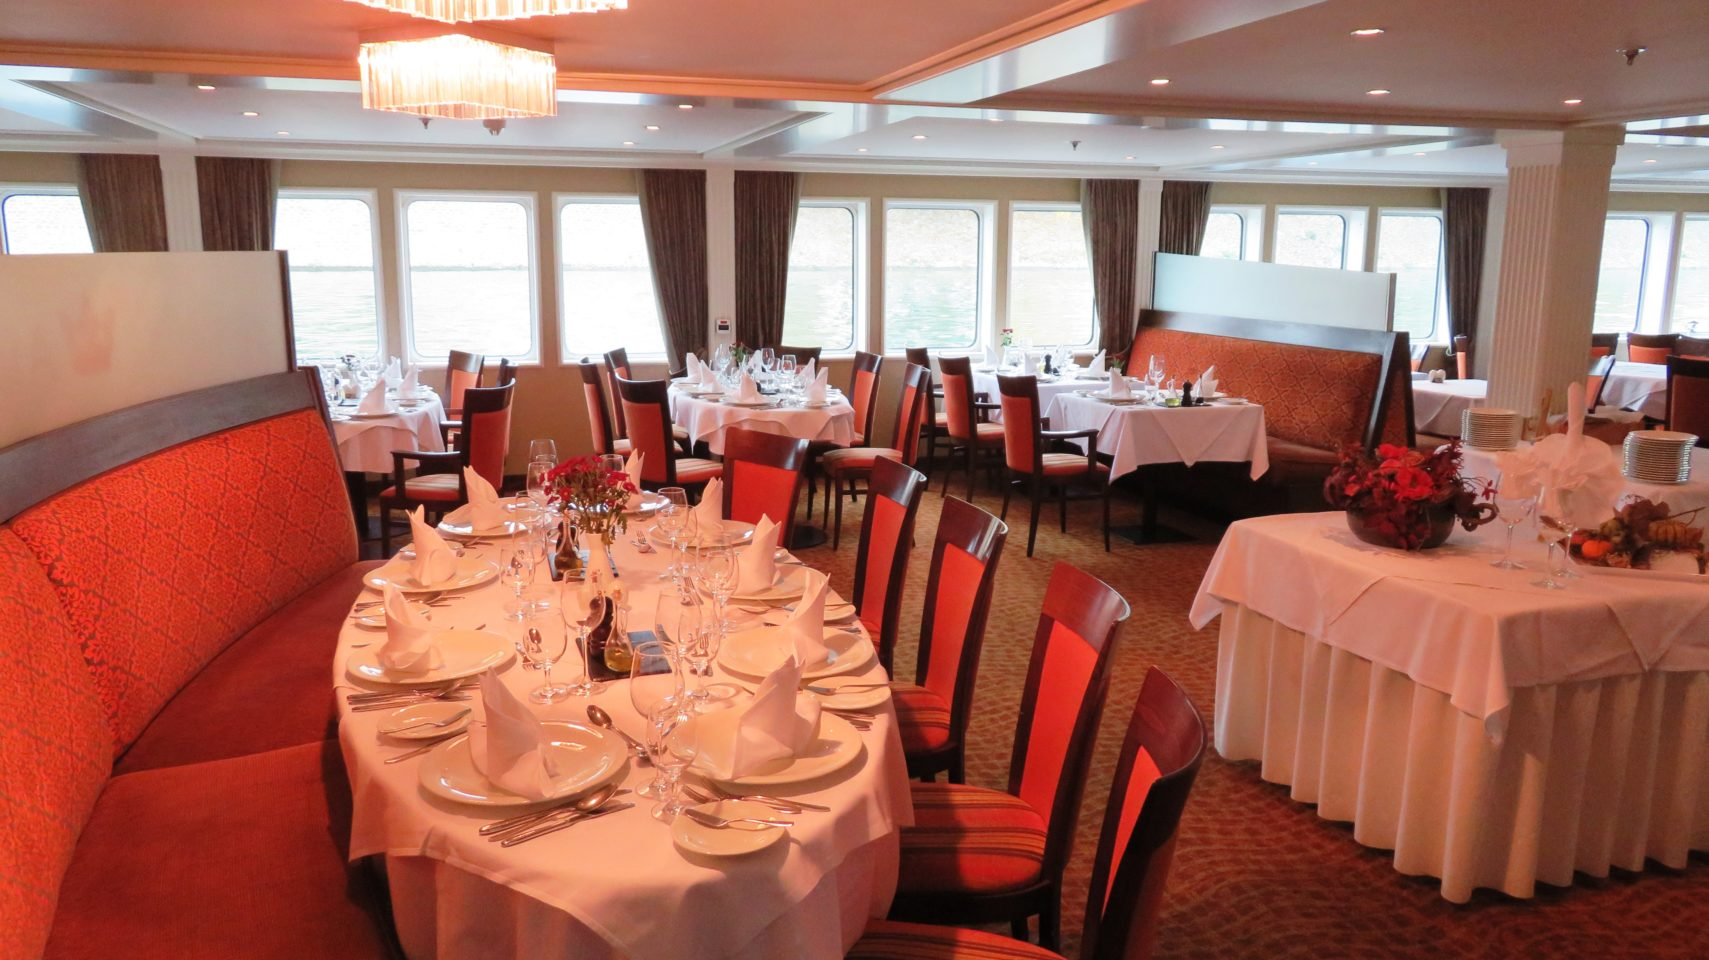 Main Dining Restaurant of the AMALegro (Paris and Normandie AMAWaterways Cruise)